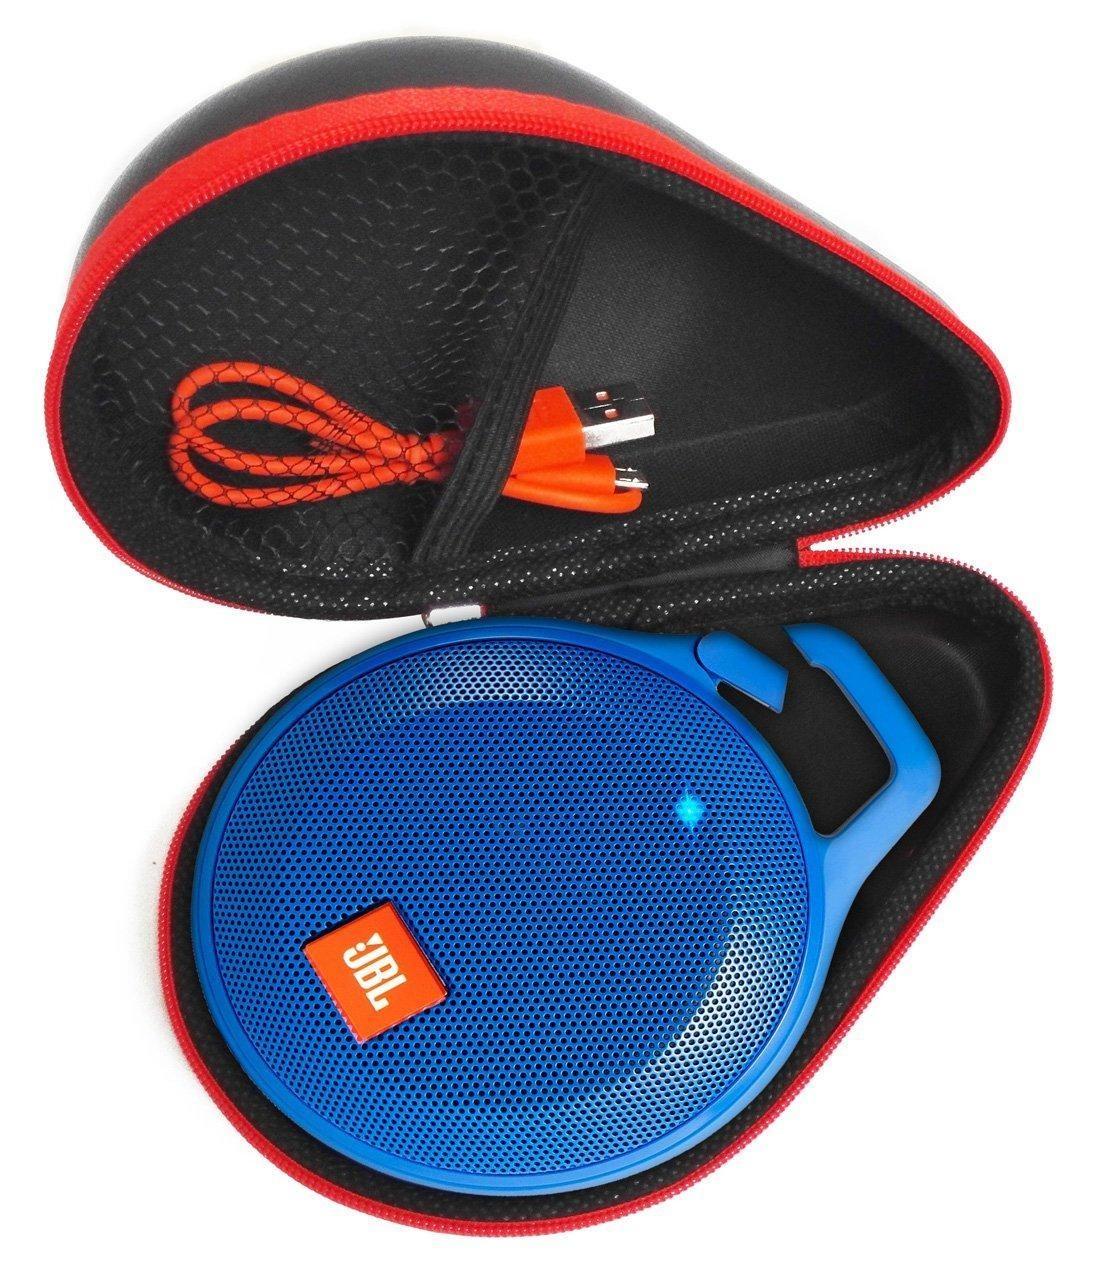 FitSand (TM) Portable Zipper Travel Carry Protective EVA Hard Case Cover Bag Box for JBL Clip+ Splashproof Portable Bluetooth Speaker